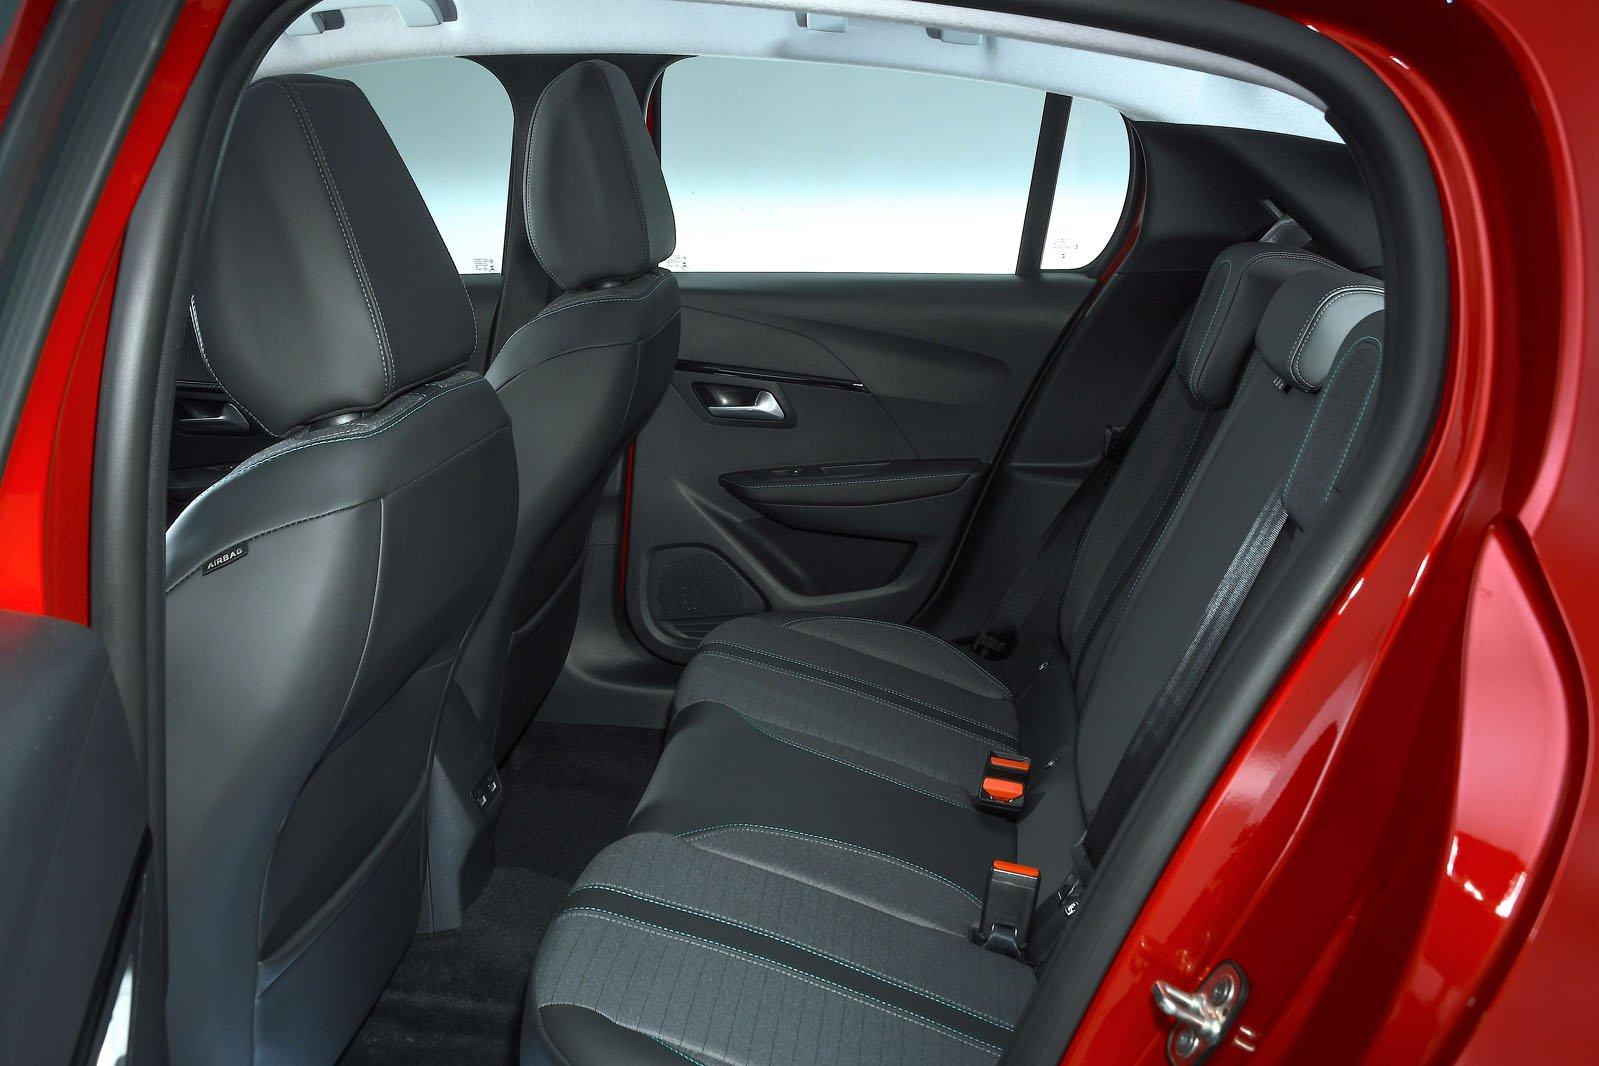 Peugeot 208 2019 rear seats (LHD)